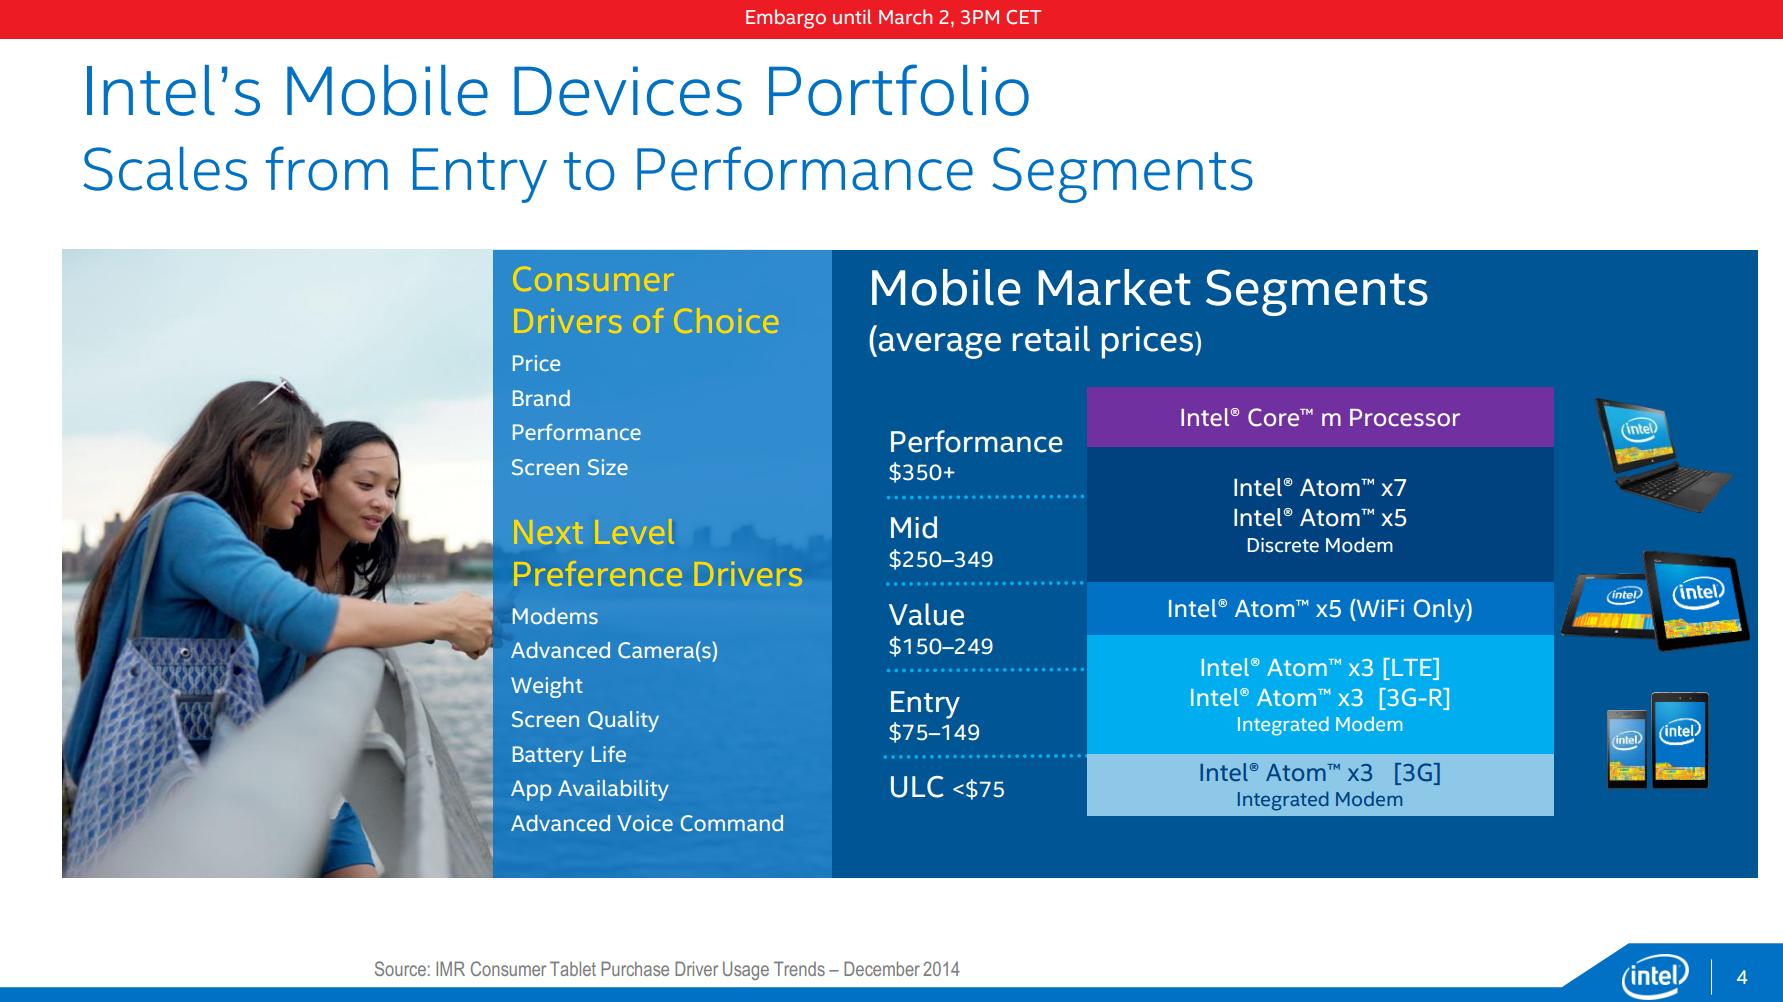 Intel Atom product segments